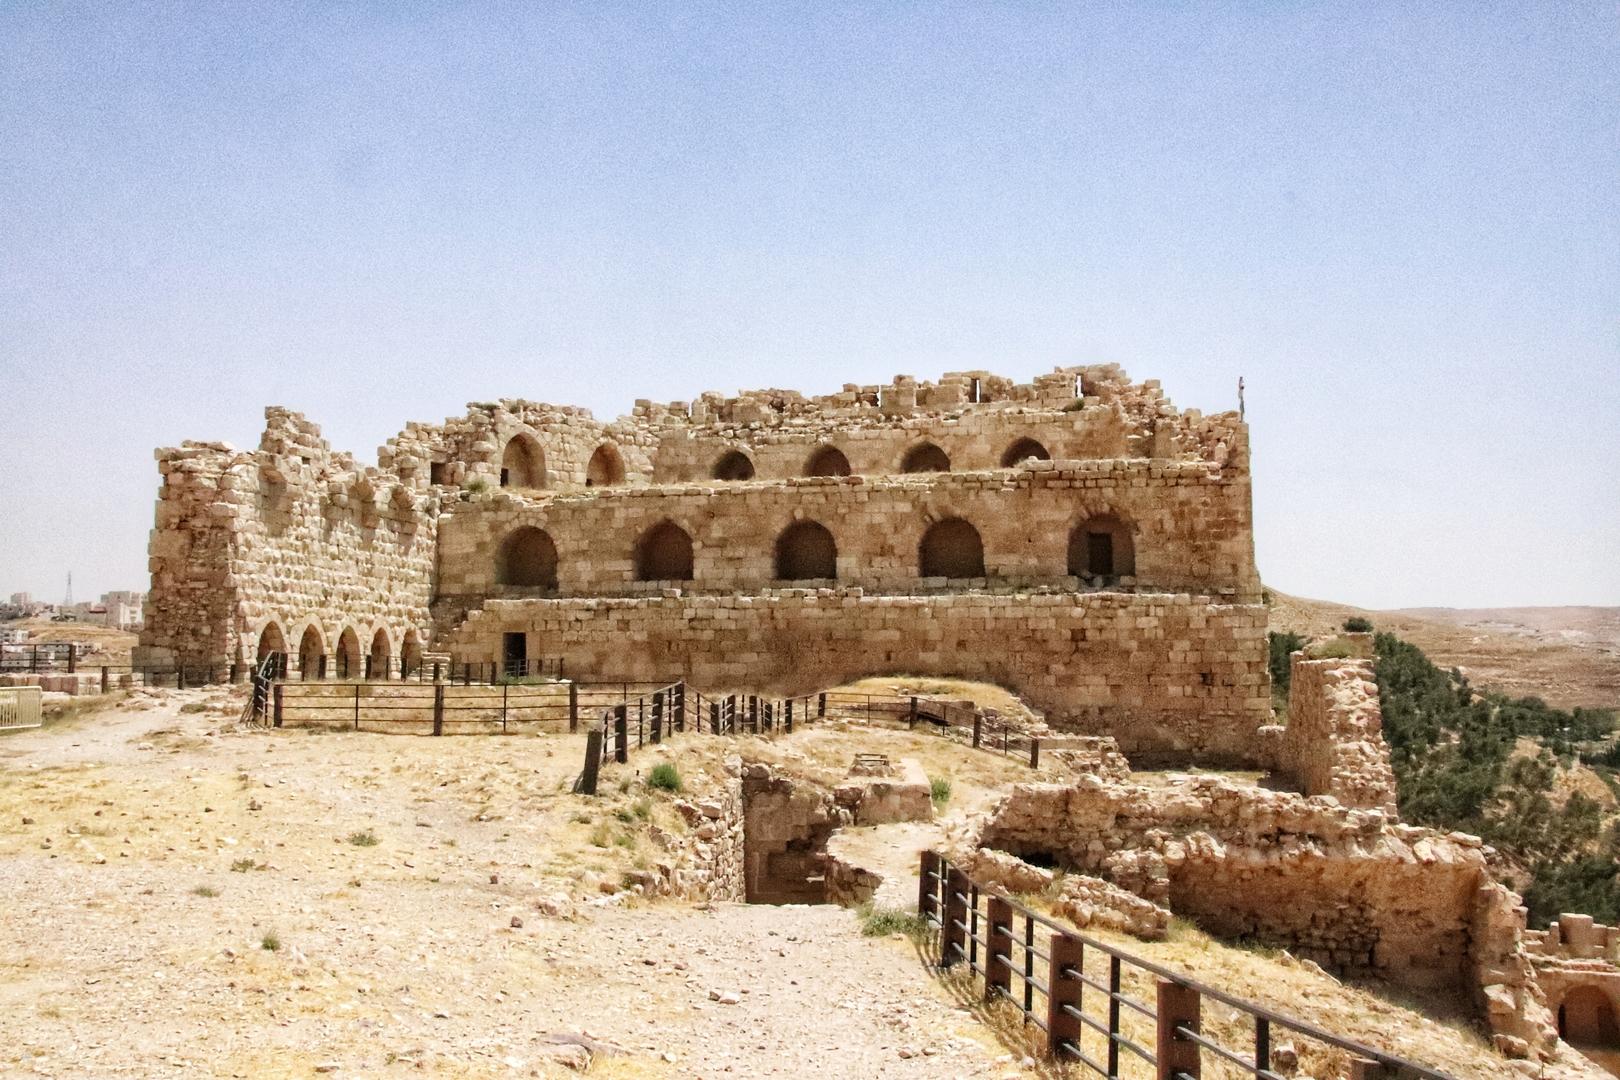 Jordanie - Visite du château de Kerak